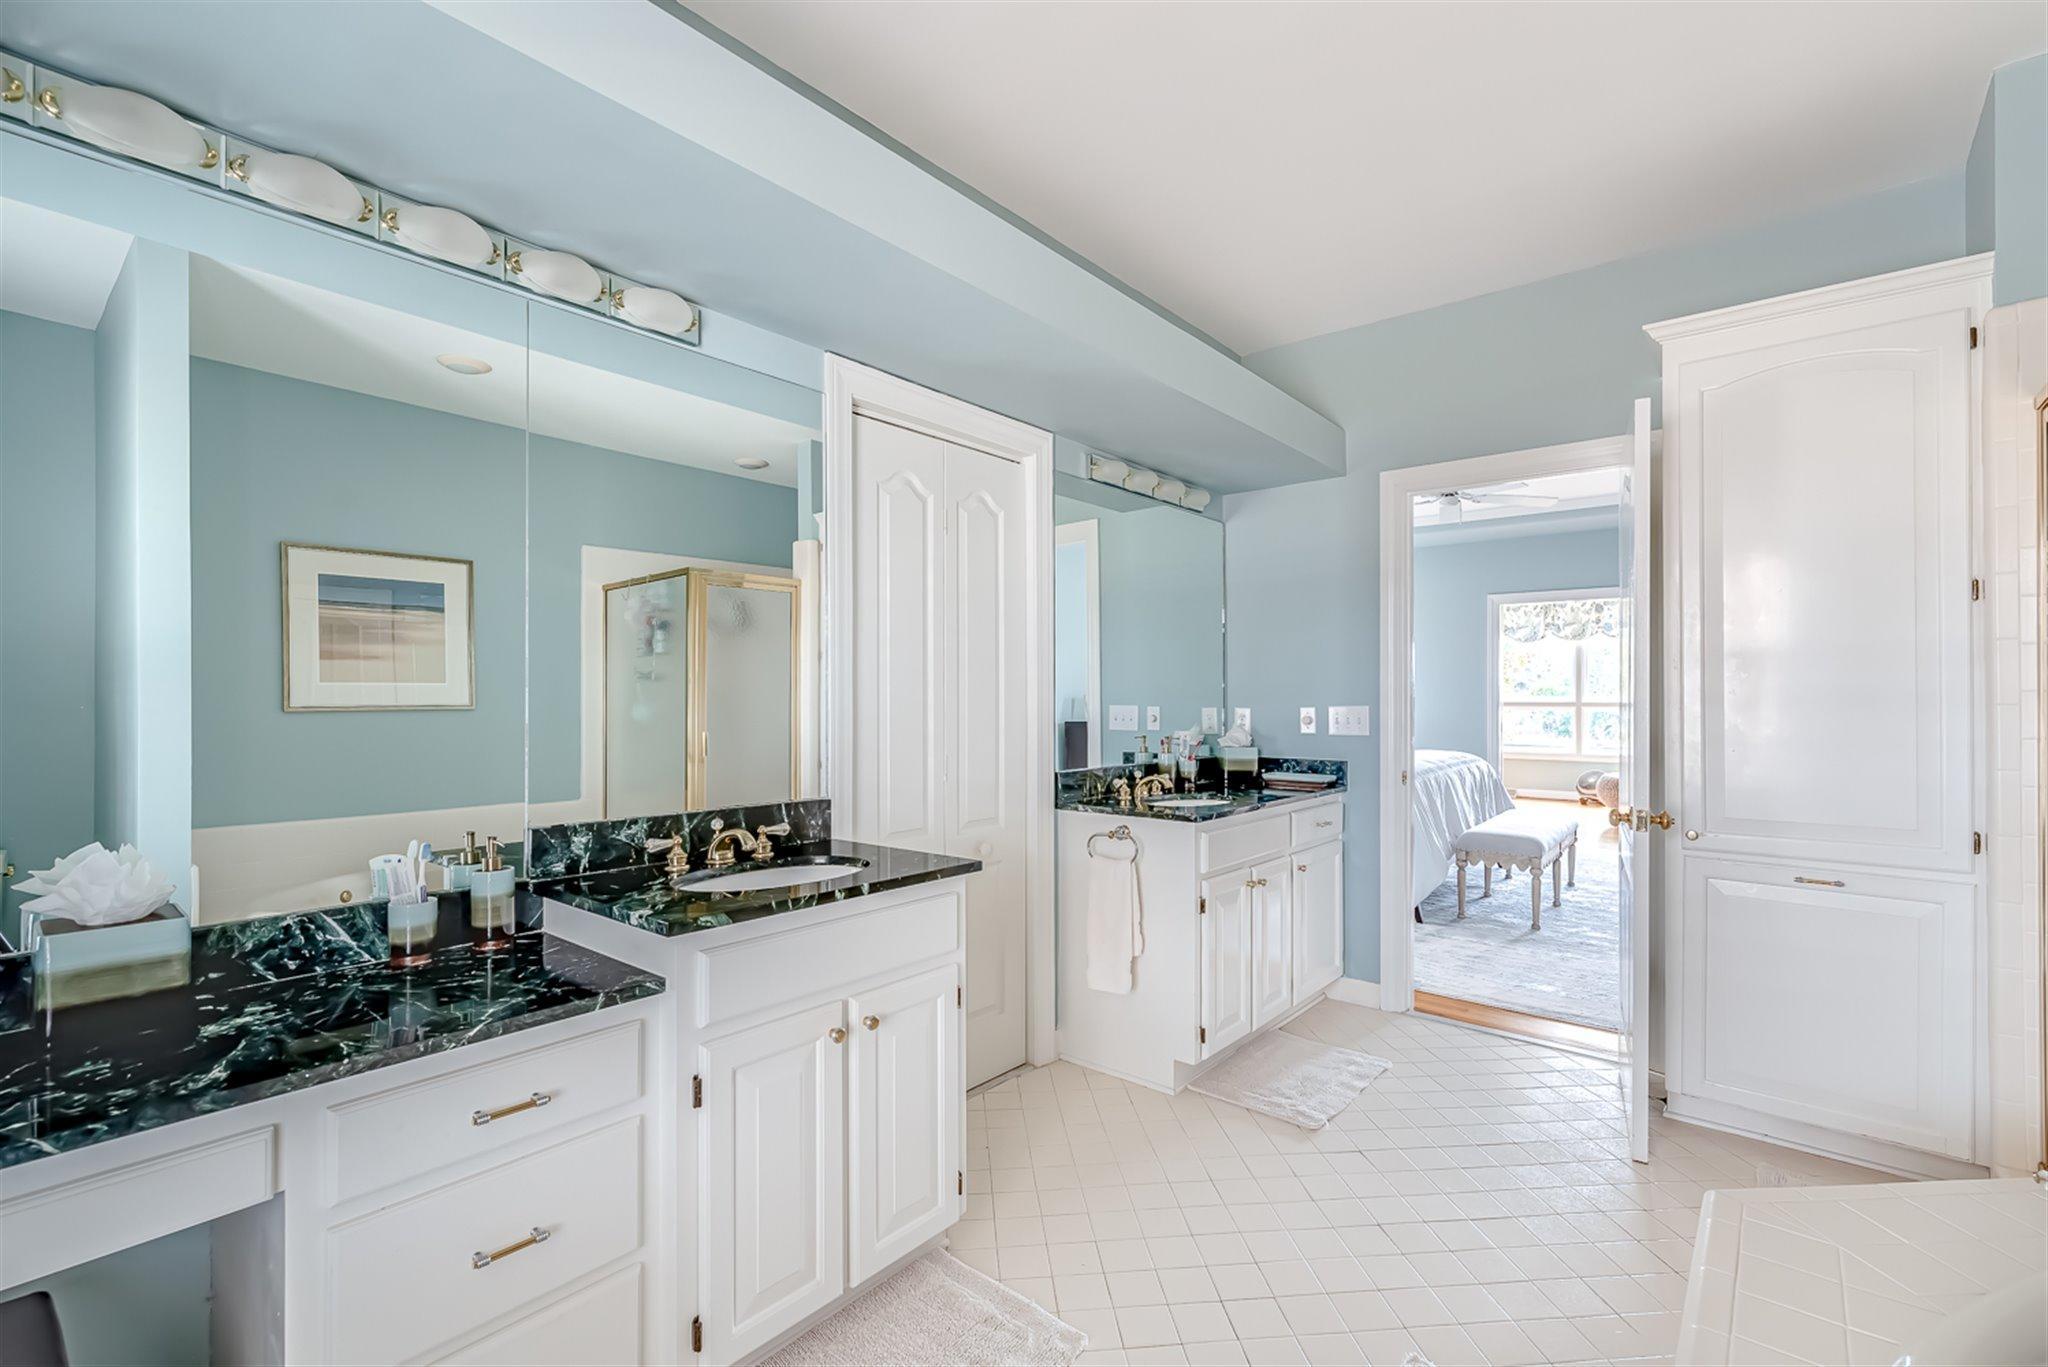 Indigo Point Homes For Sale - 50 Indigo Point, Charleston, SC - 29